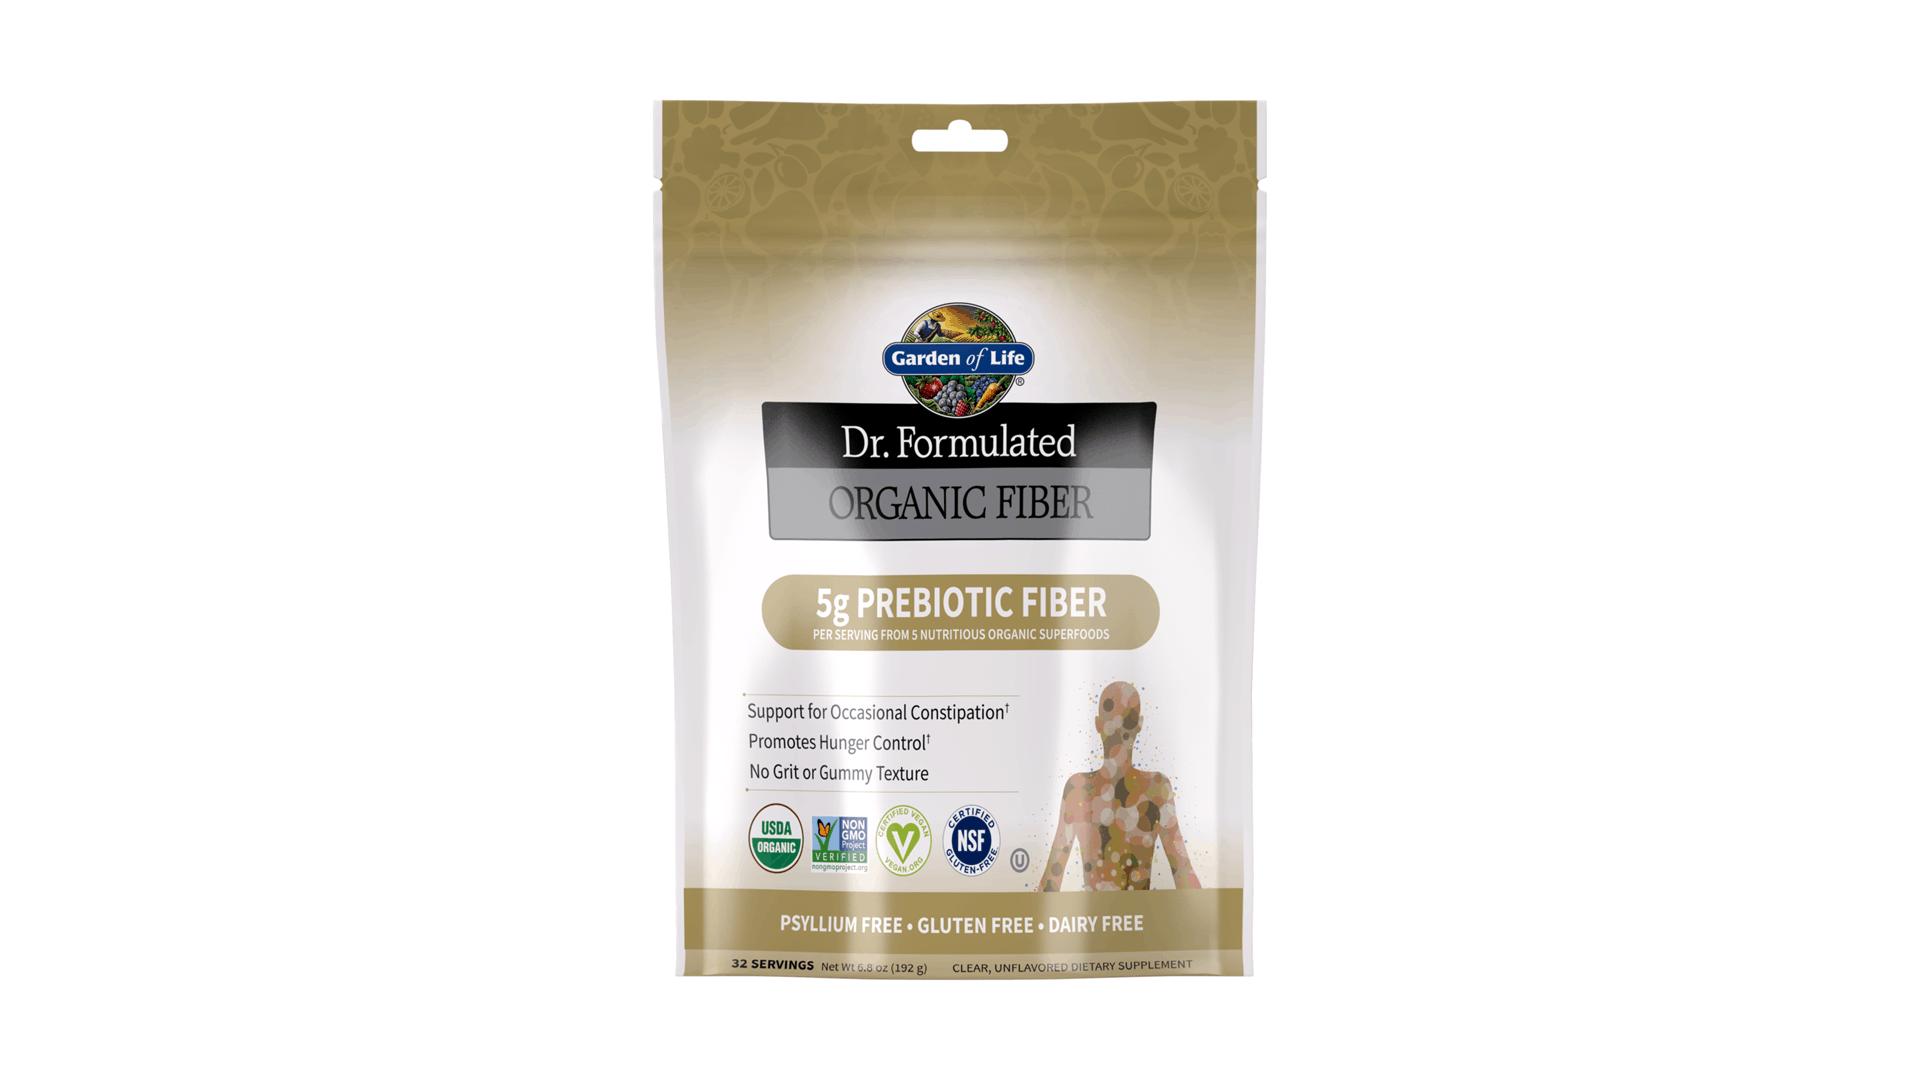 Garden of Life Dr Formulated Fiber supplements